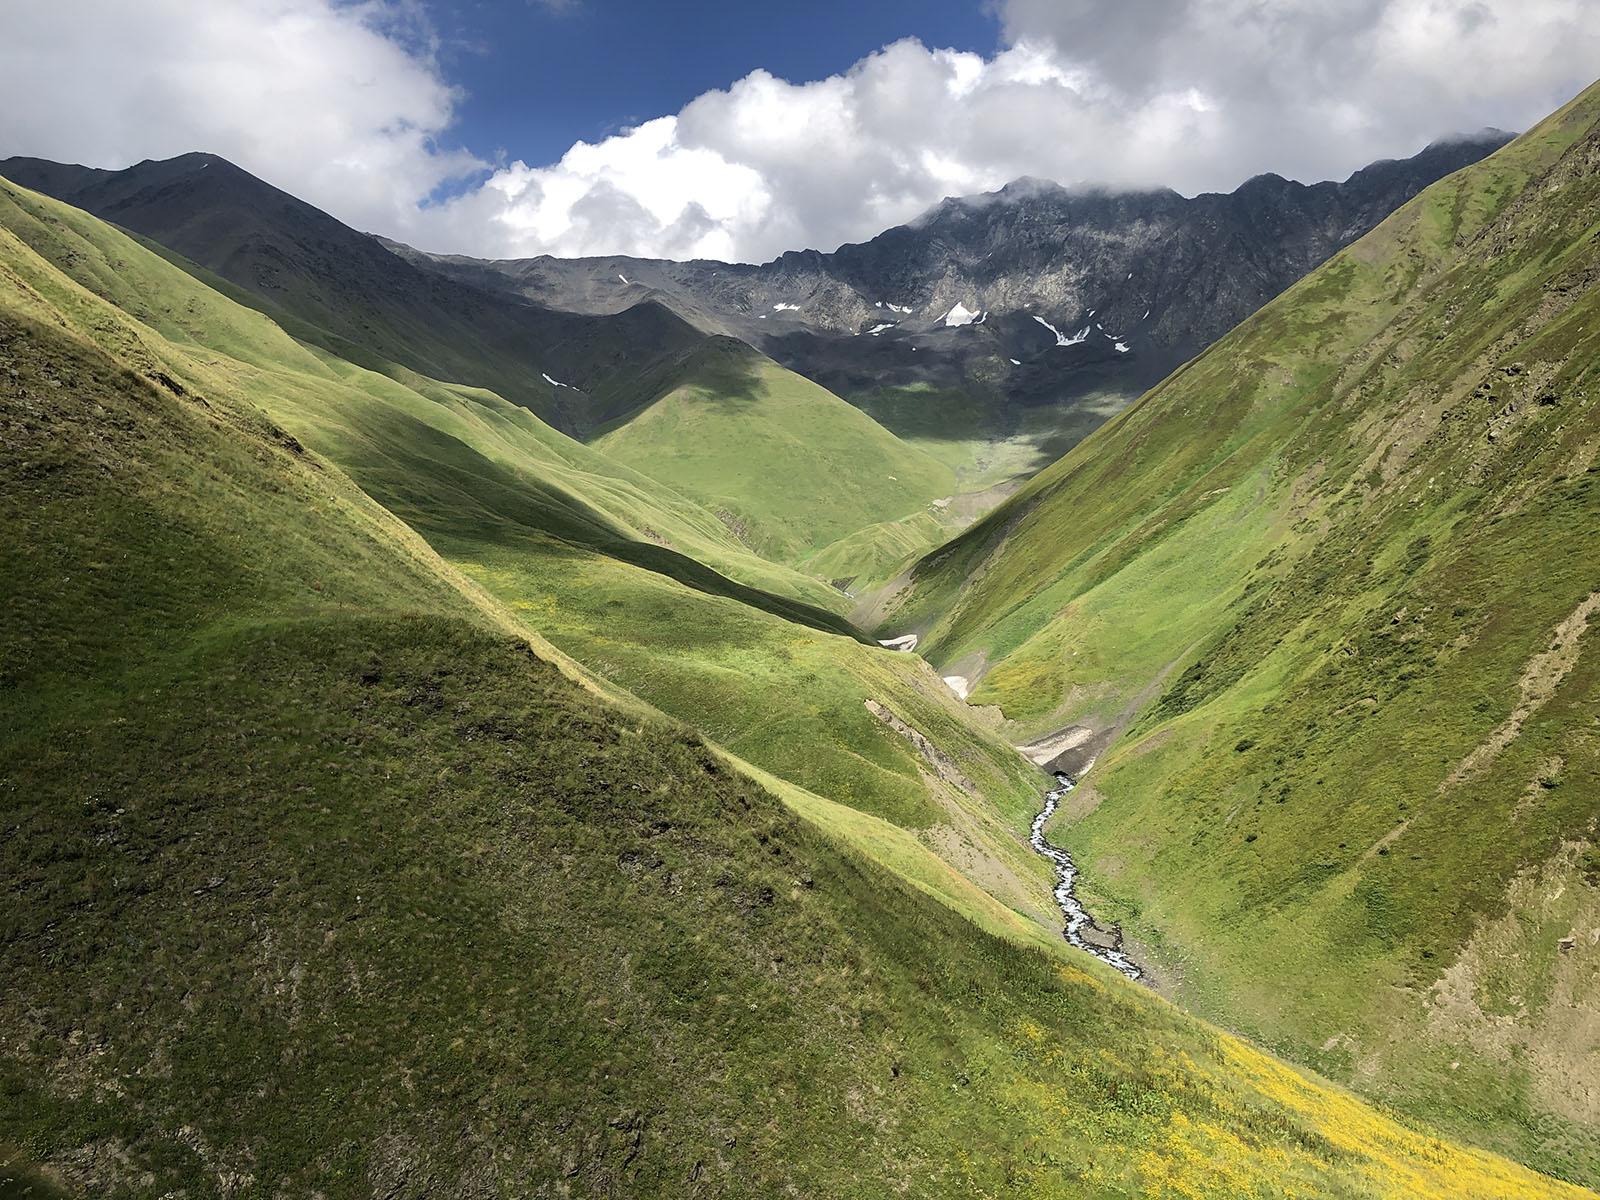 Долина реки Закка. Вид на перевал Закка